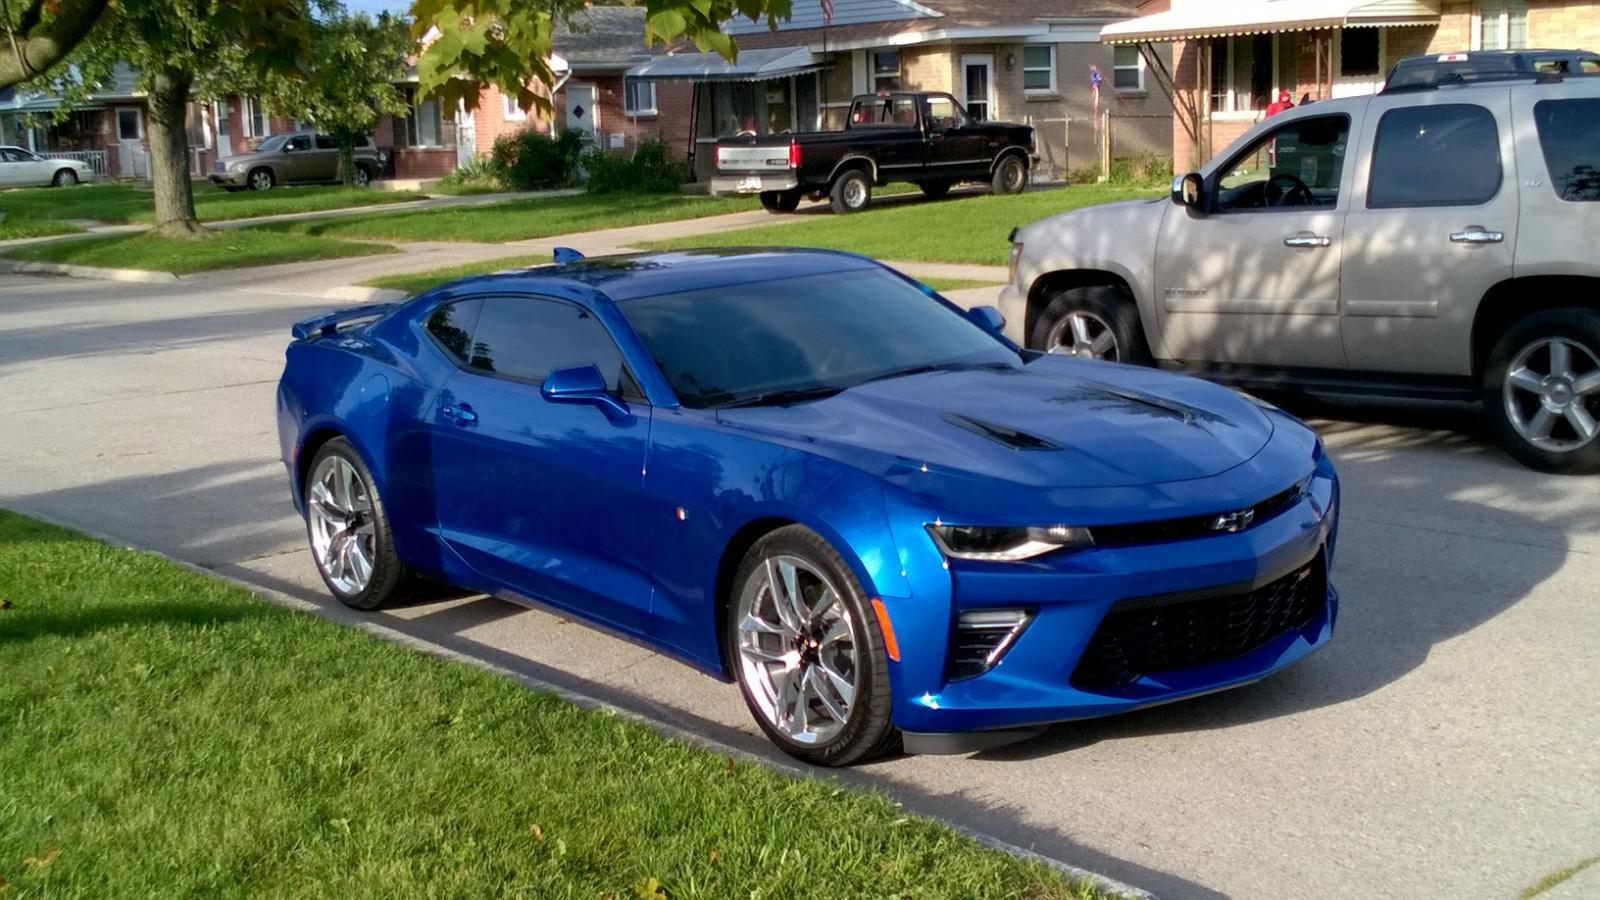 2017 camaro ss blue best new cars for 2018. Black Bedroom Furniture Sets. Home Design Ideas